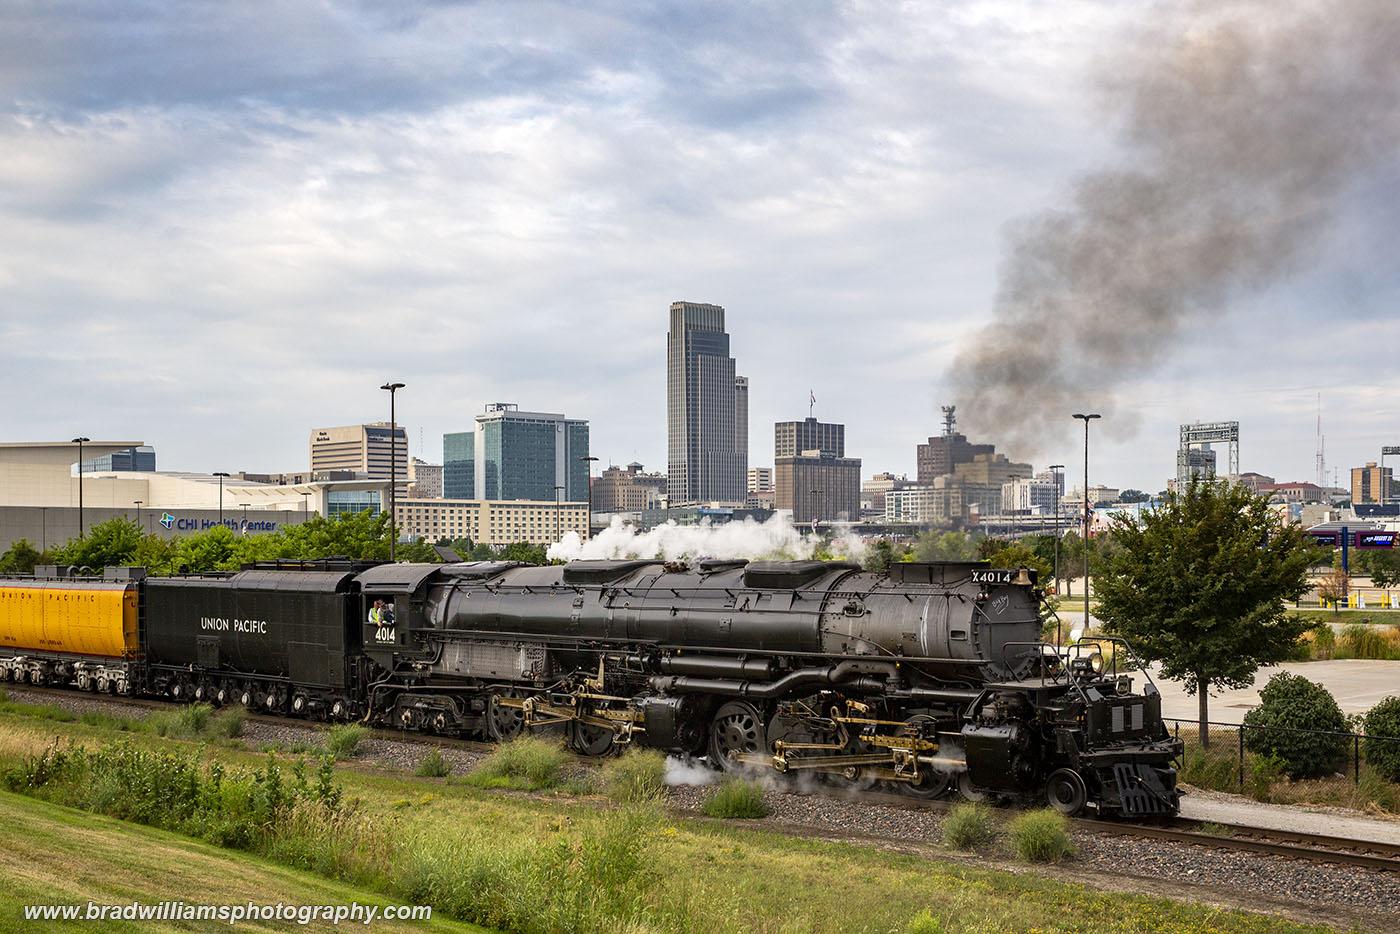 BigBoy, 4014, Union Pacific, Steam, Locomotive, Railroad, Train, History, Nebraska, Omaha, photo